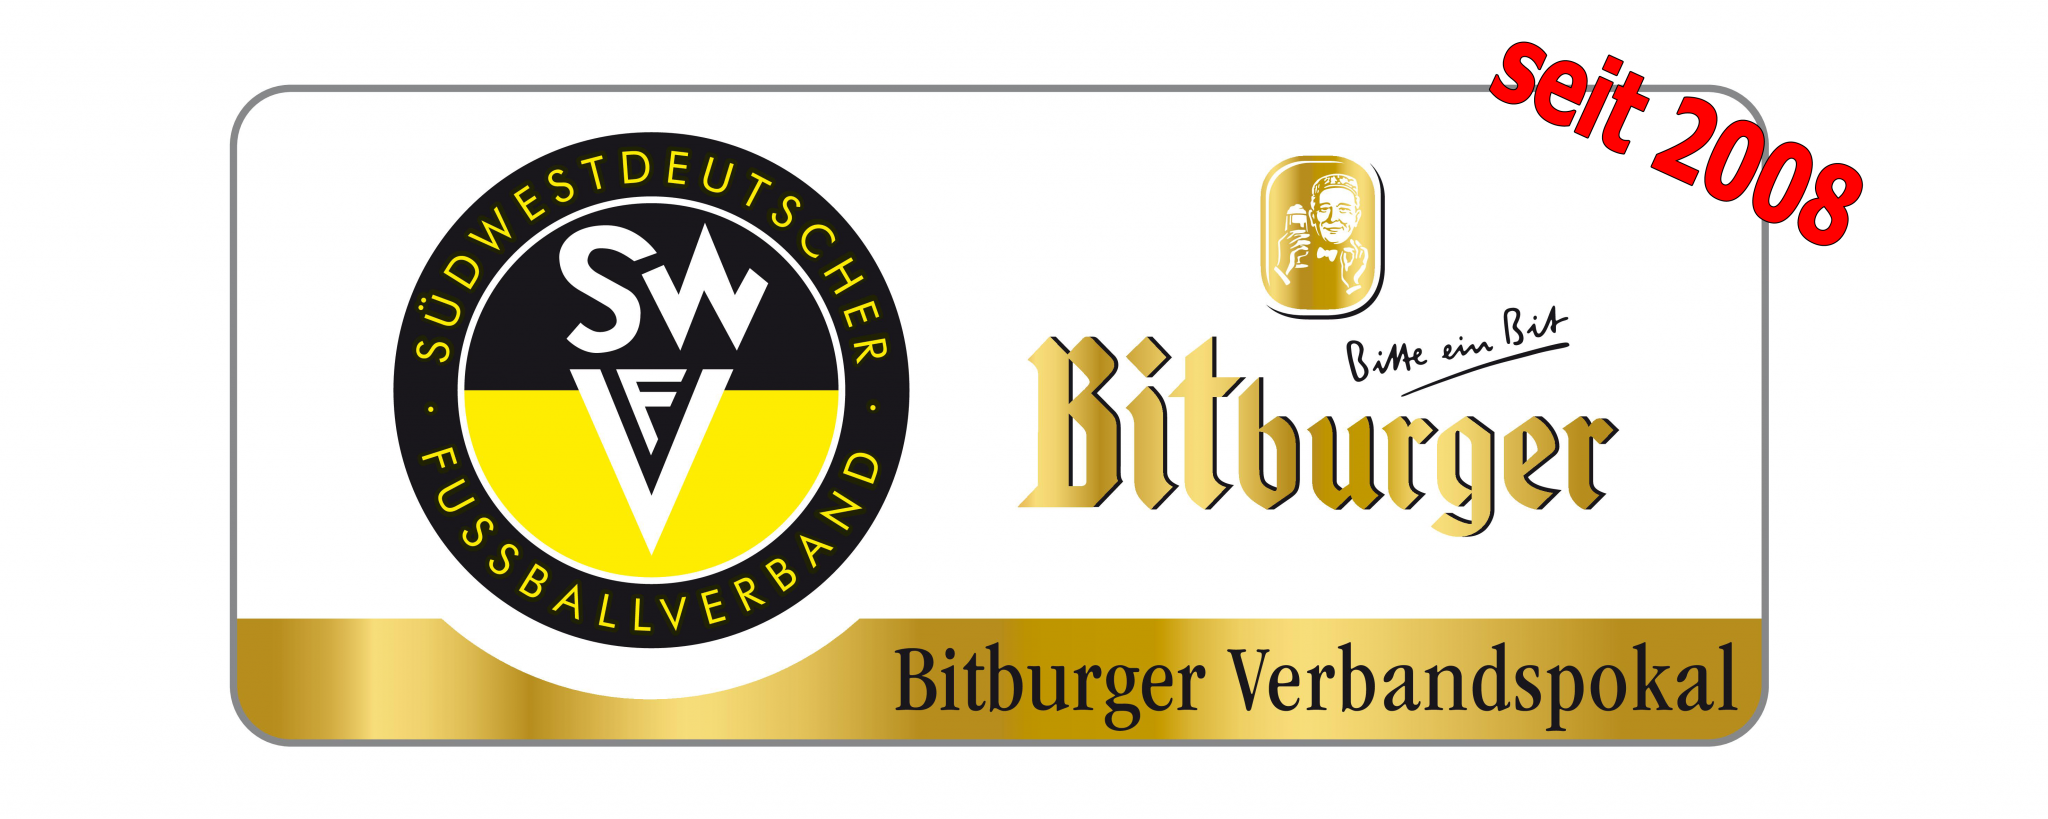 Bitburger-Verbandspokal-Logo